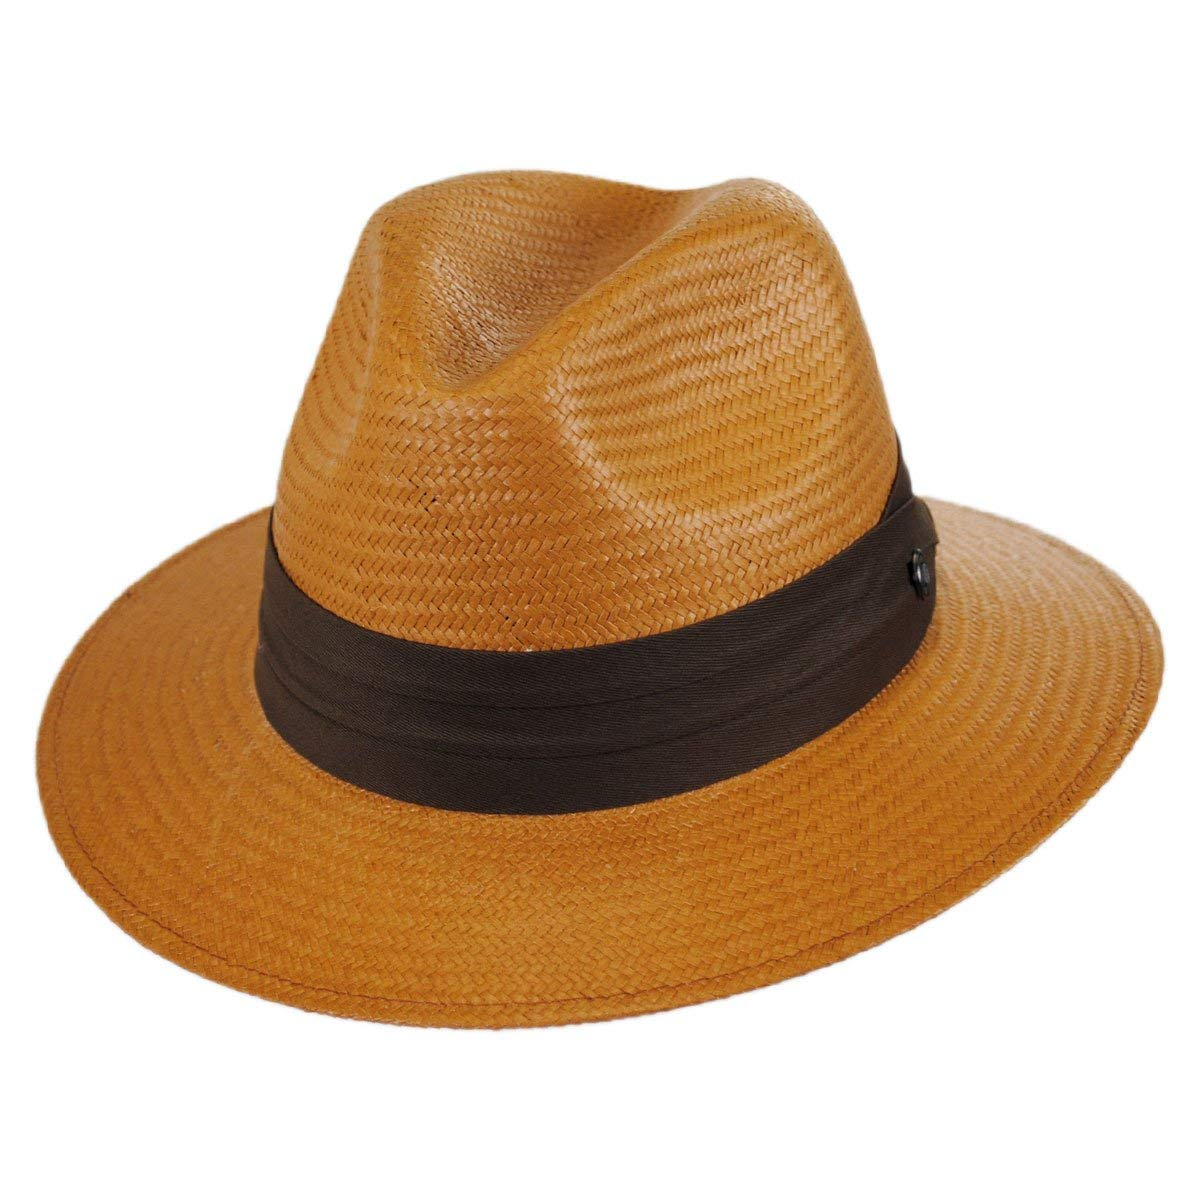 0e081b5f444 Get Quotations · Jaxon Augusta Toyo Straw Safari Fedora Hat